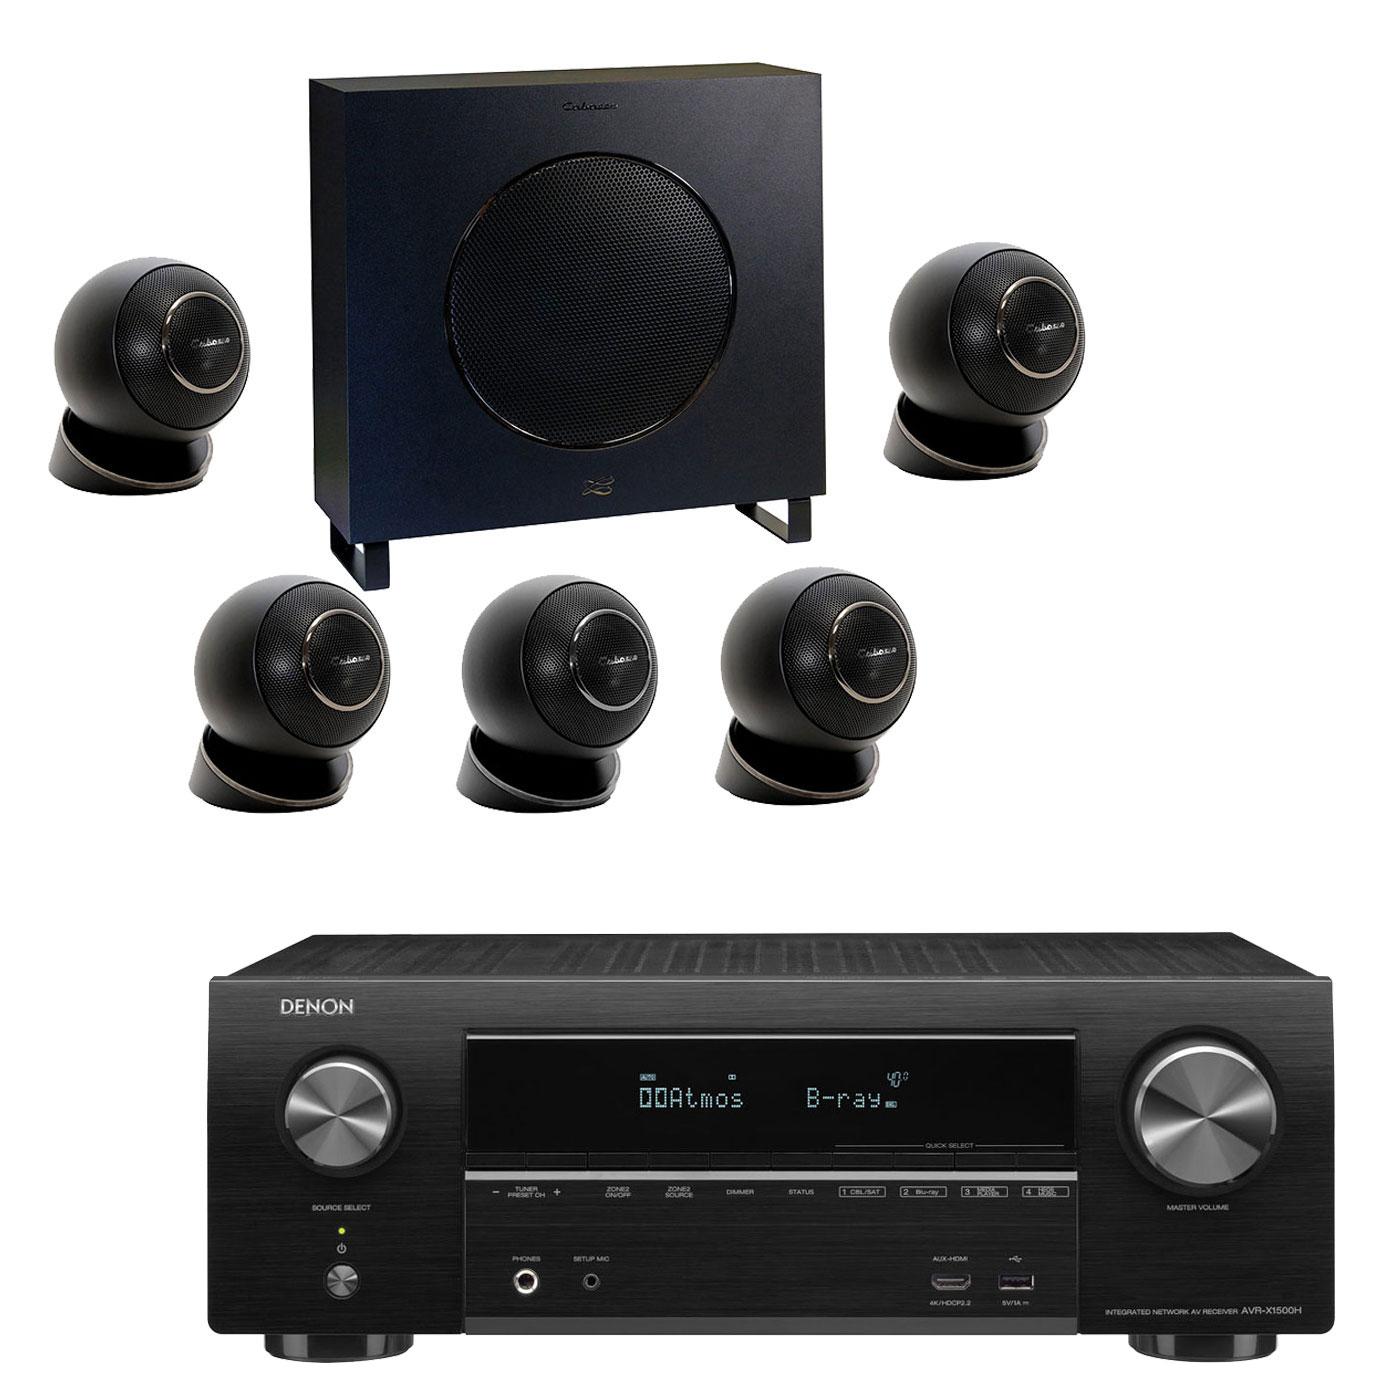 Ensemble home cinéma Denon AVR-X1500H Noir + Cabasse Eole 4 Noir Ampli-tuner Home Cinema 3D Ready 7.2 - Dolby Atmos / DTS:X - 6x HDMI 4K Ultra HD, HDCP 2.2, HDR - Wi-Fi, Bluetooth, AirPlay 2 - Multiroom - Amazon Alexa + Pack d'enceintes 5.1